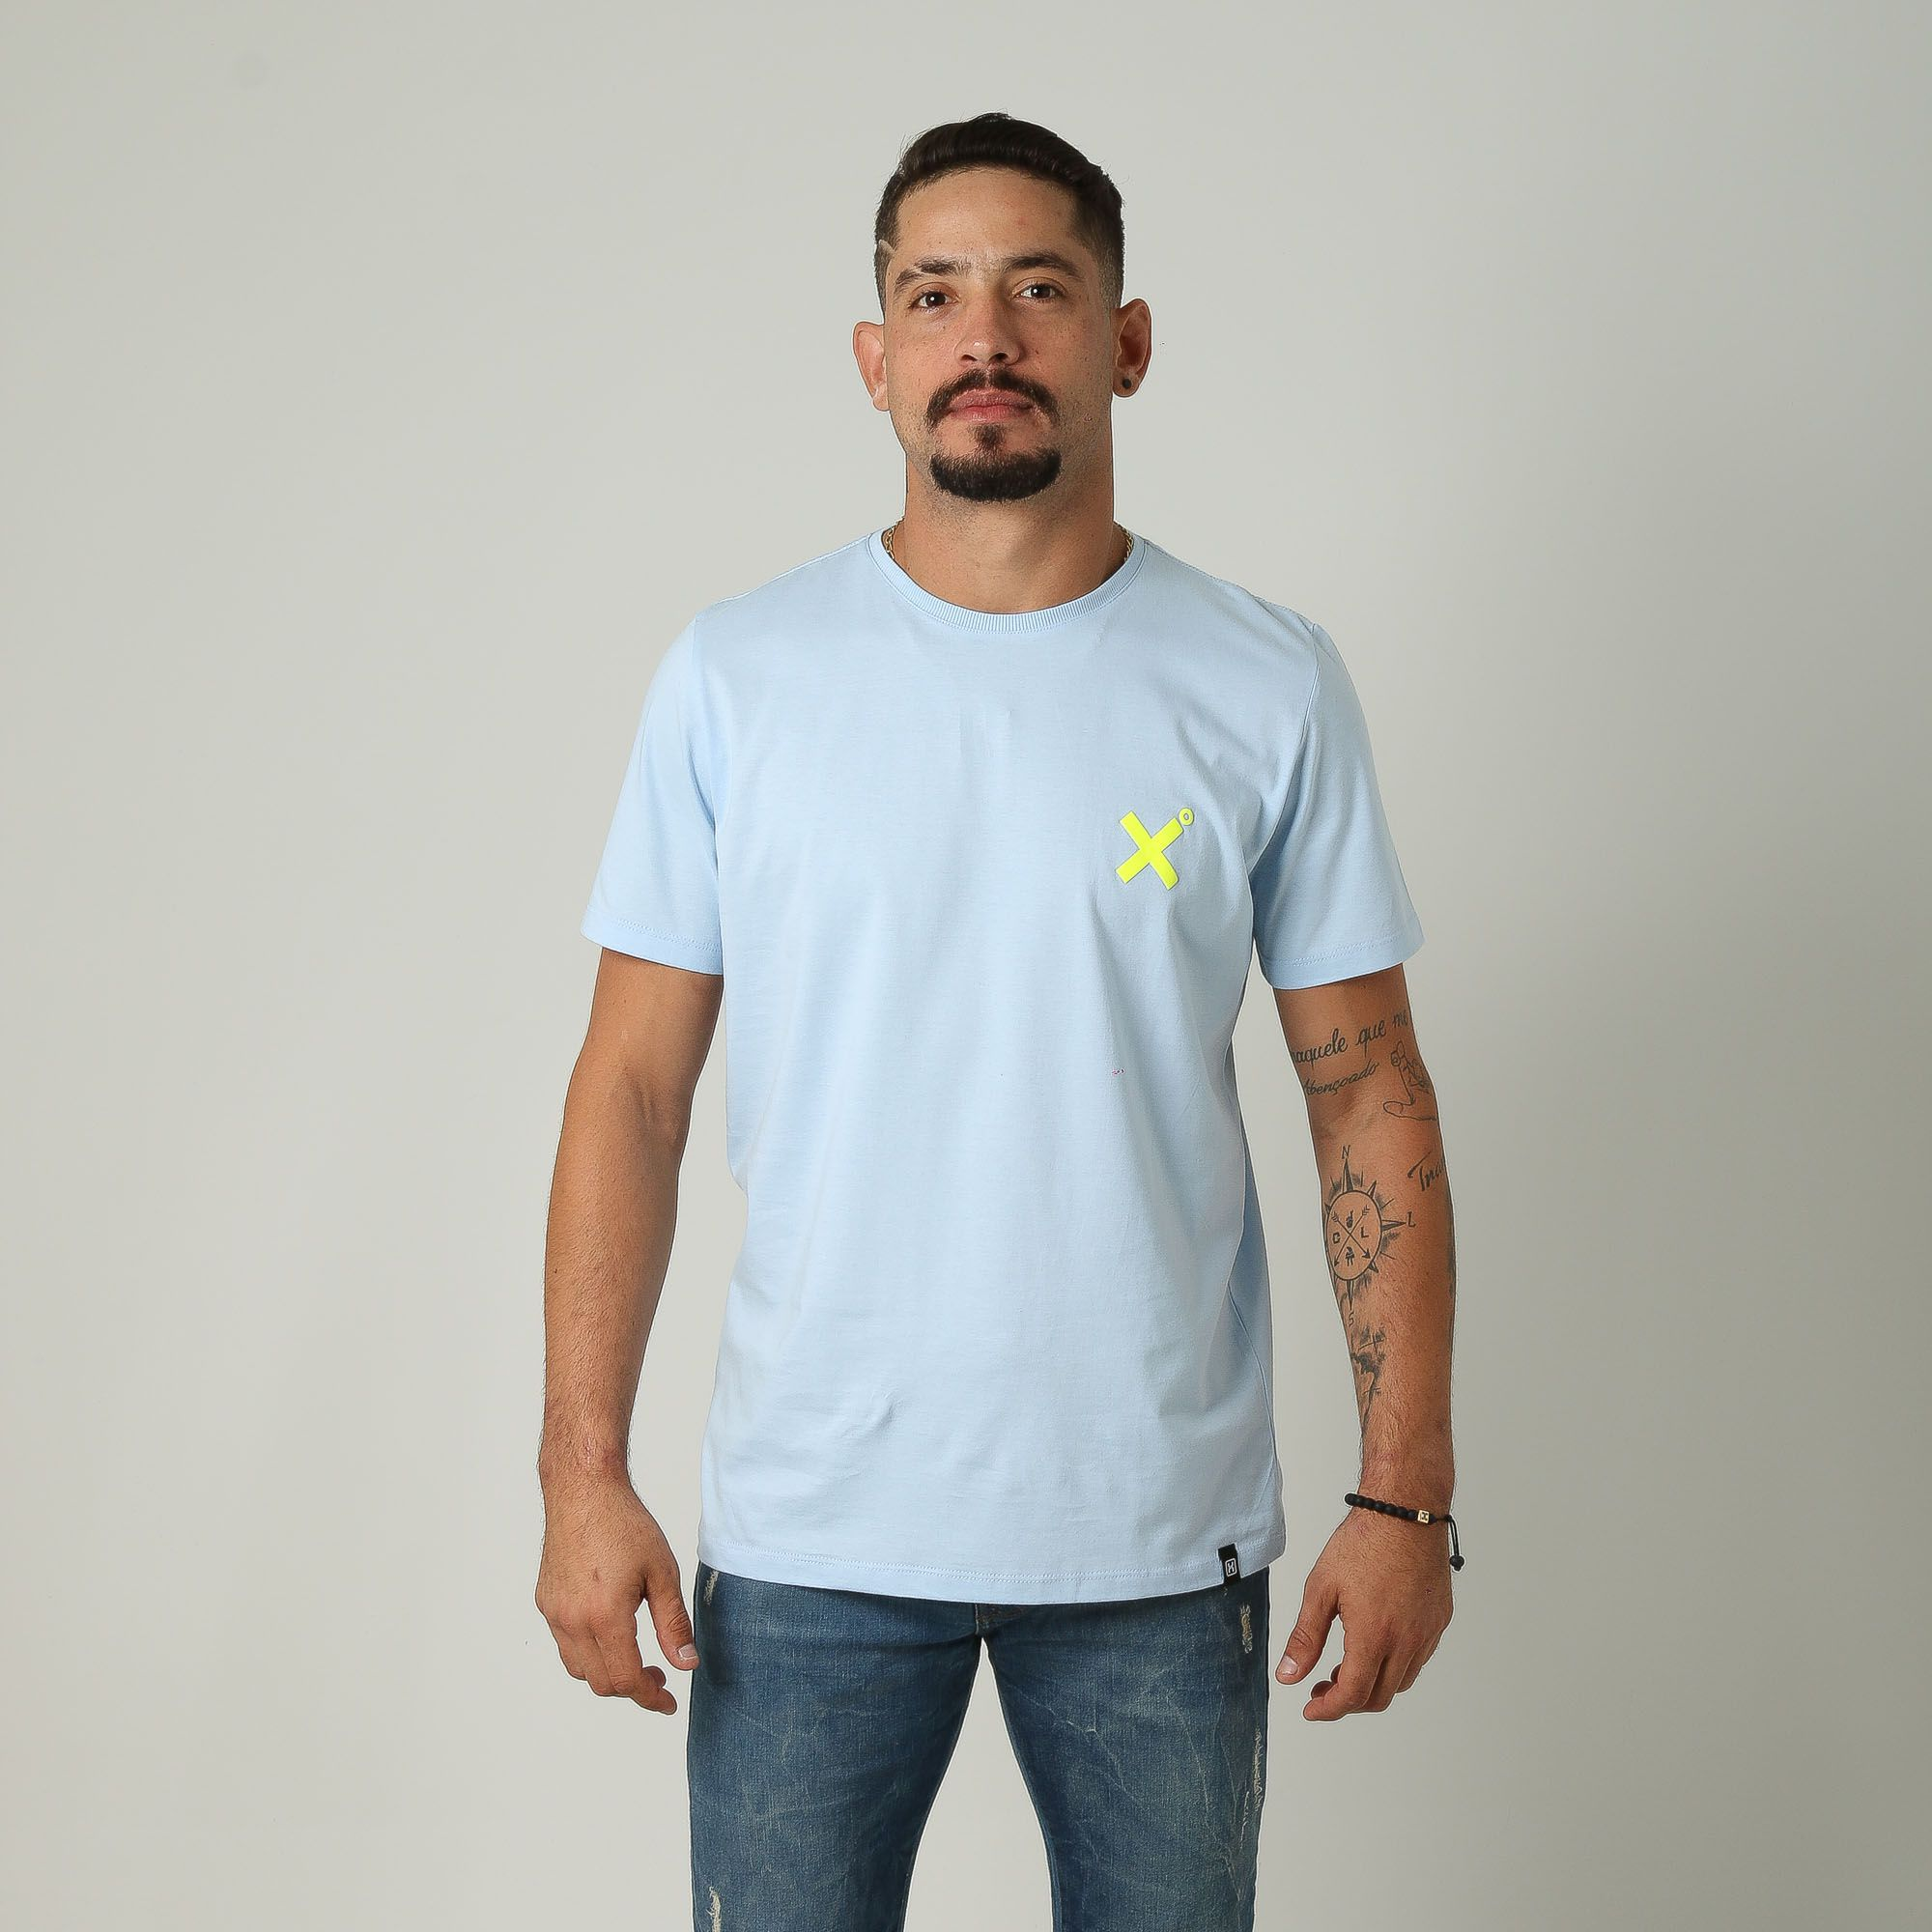 Camiseta Masculina TXC 1860